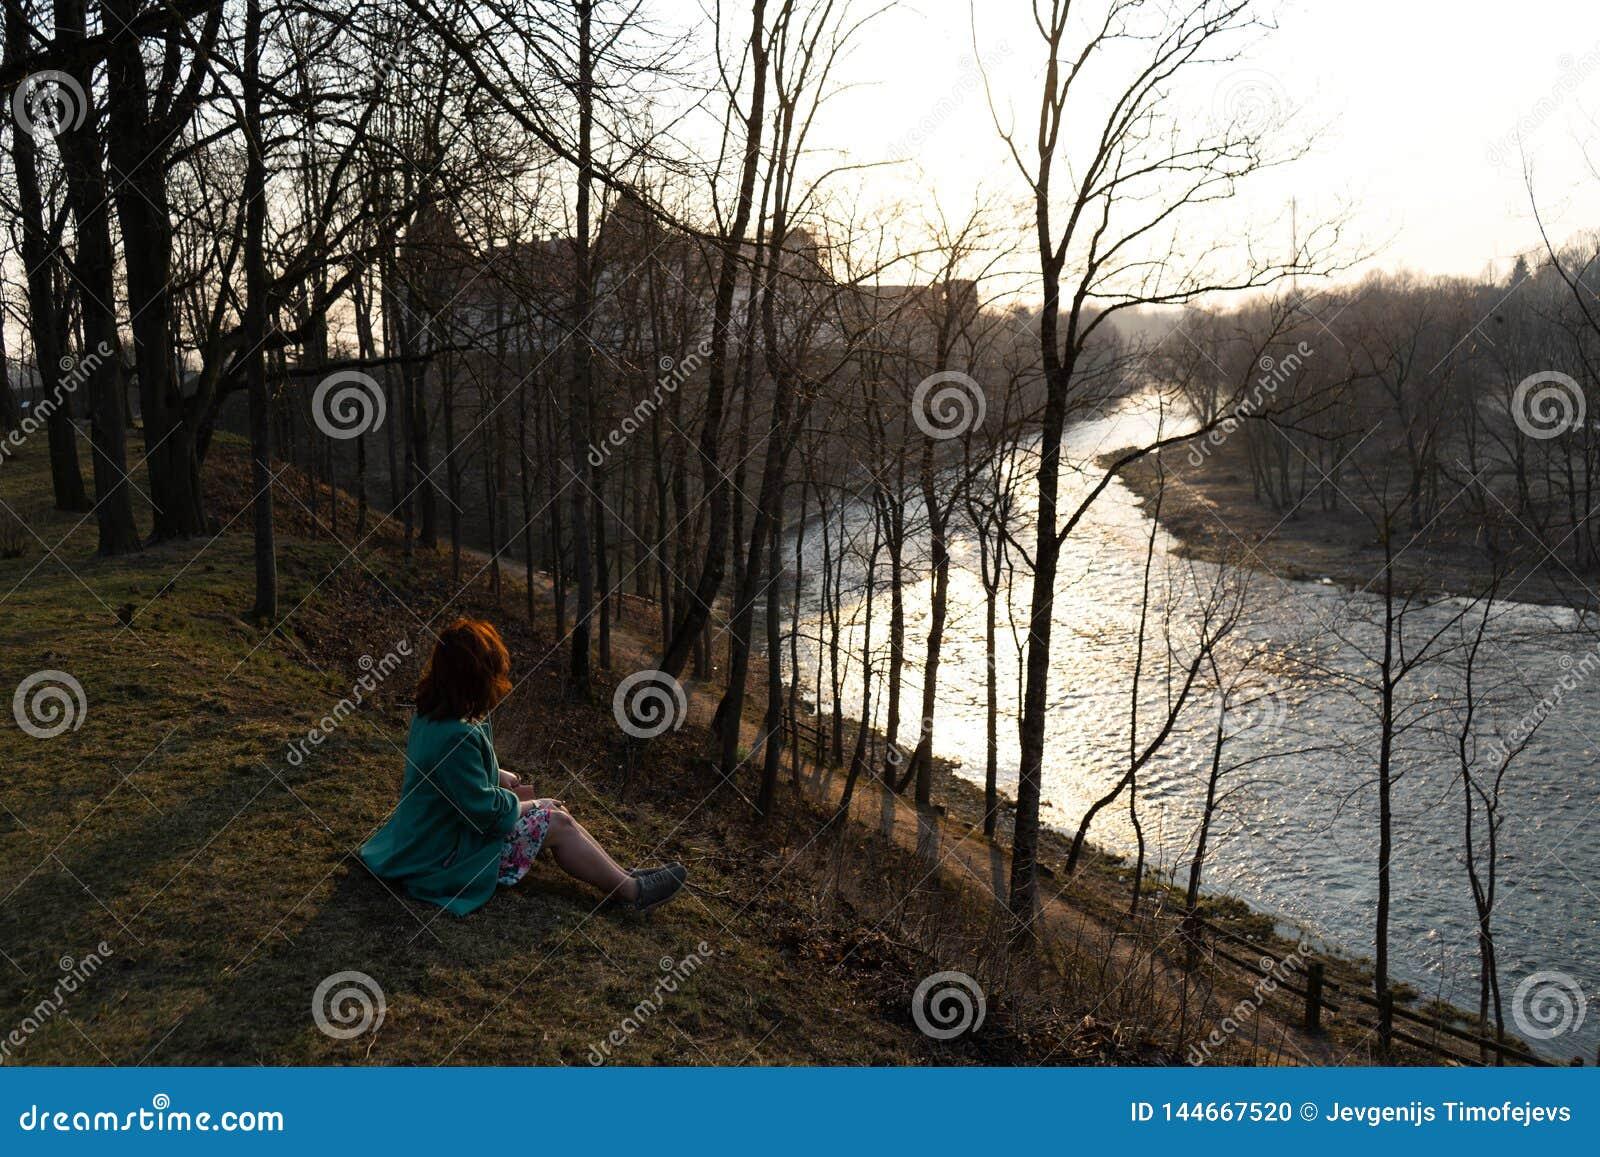 Young fashion woman relaxing and enjoying sunset near a river in Bauska, Latvia, 2019